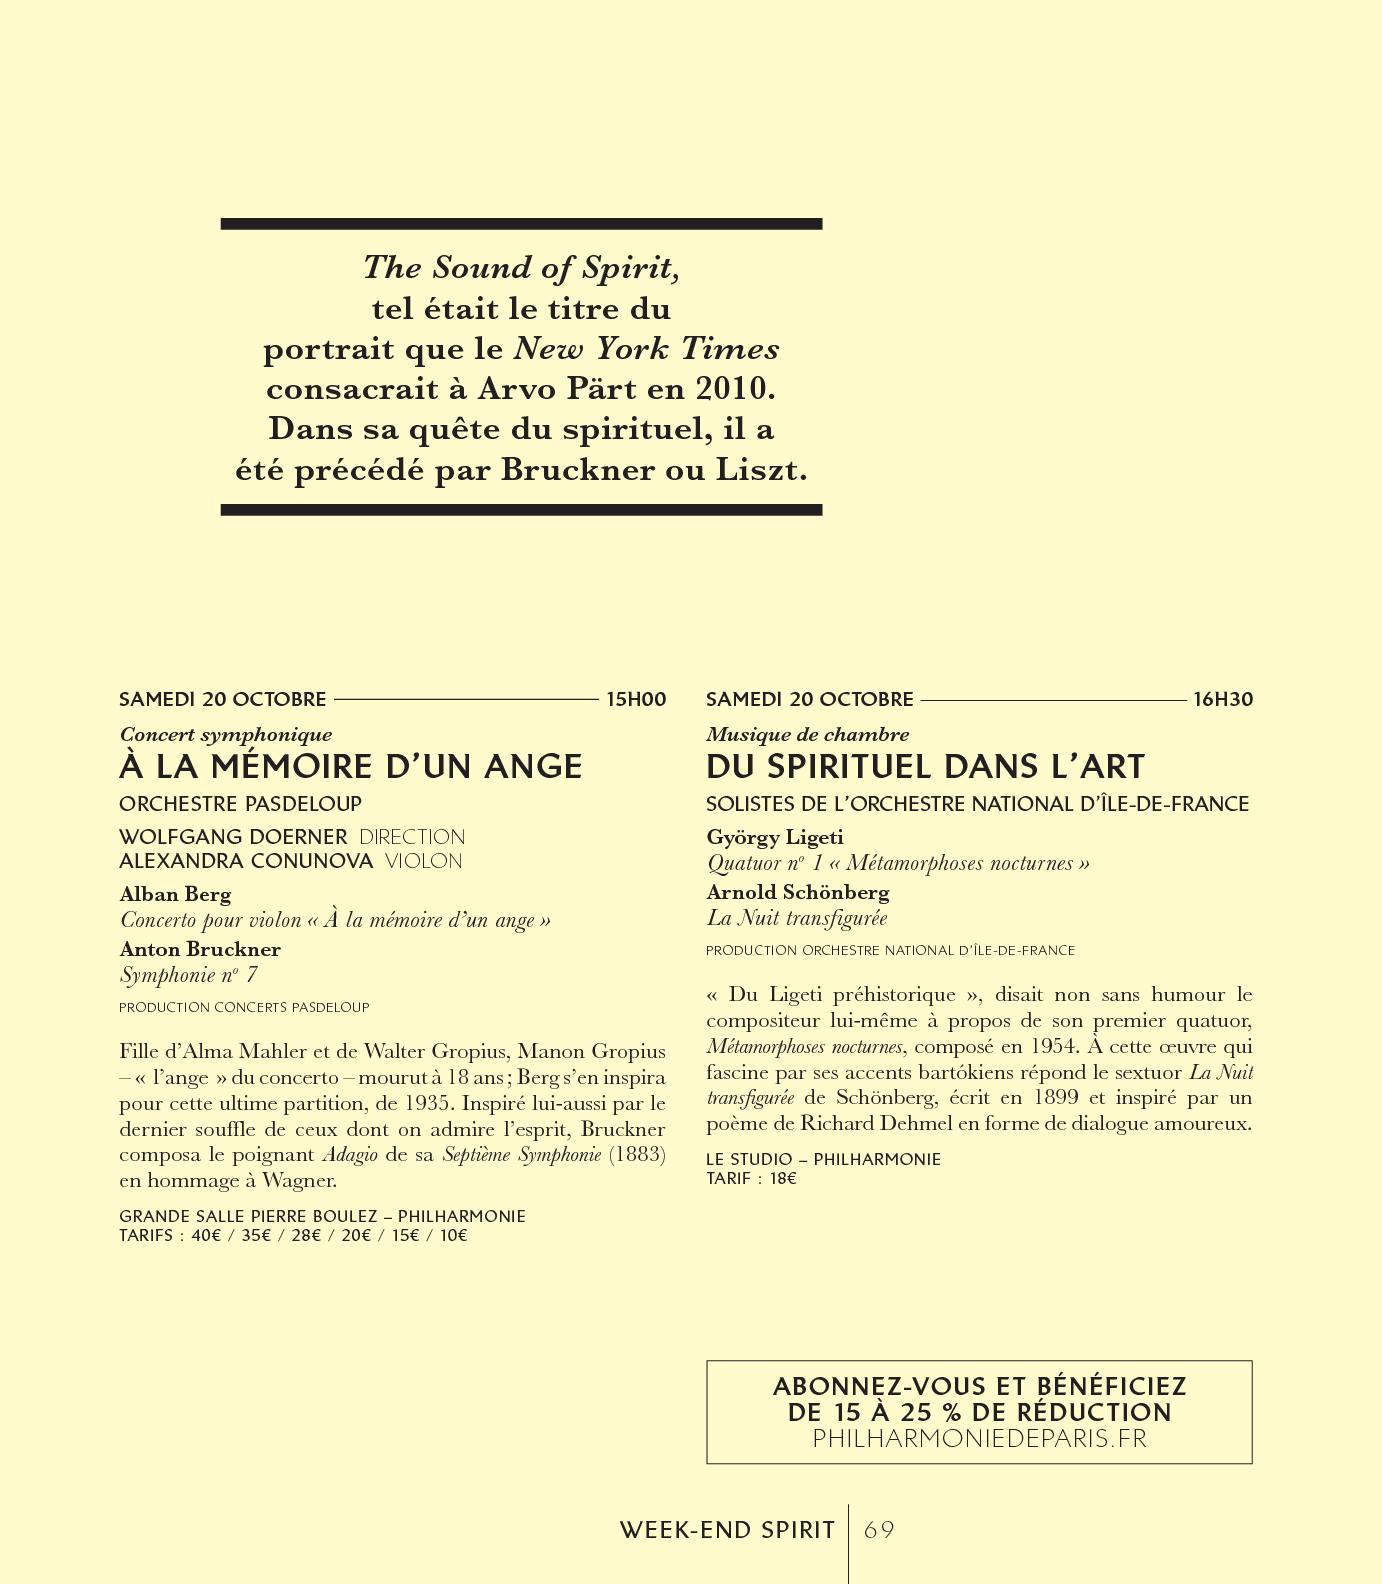 Brochure Philharmonie 2018 19 Calameo Downloader